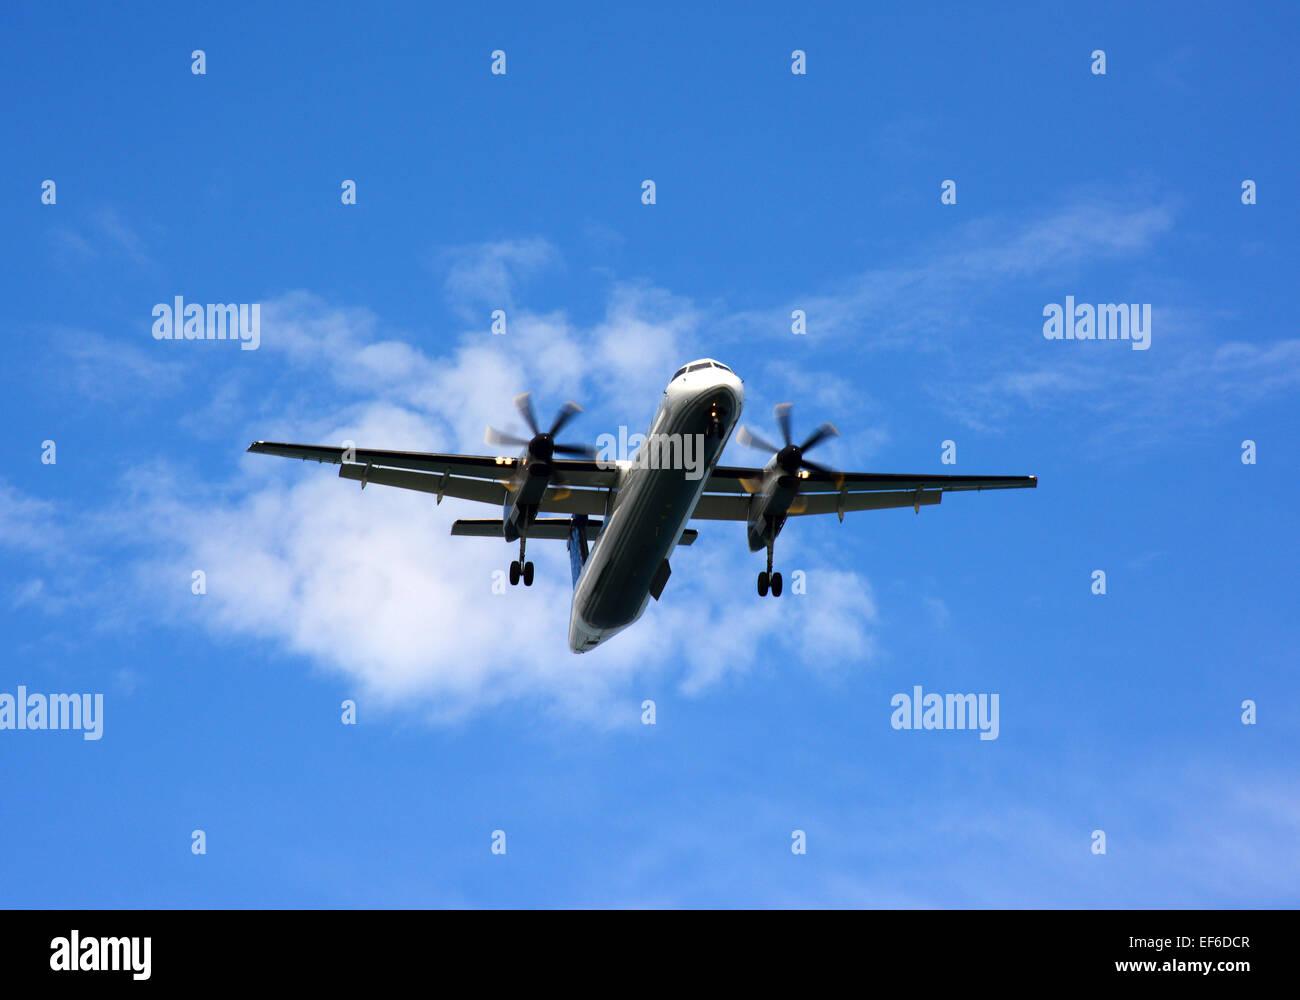 Porter airline airplane Landing - Stock Image